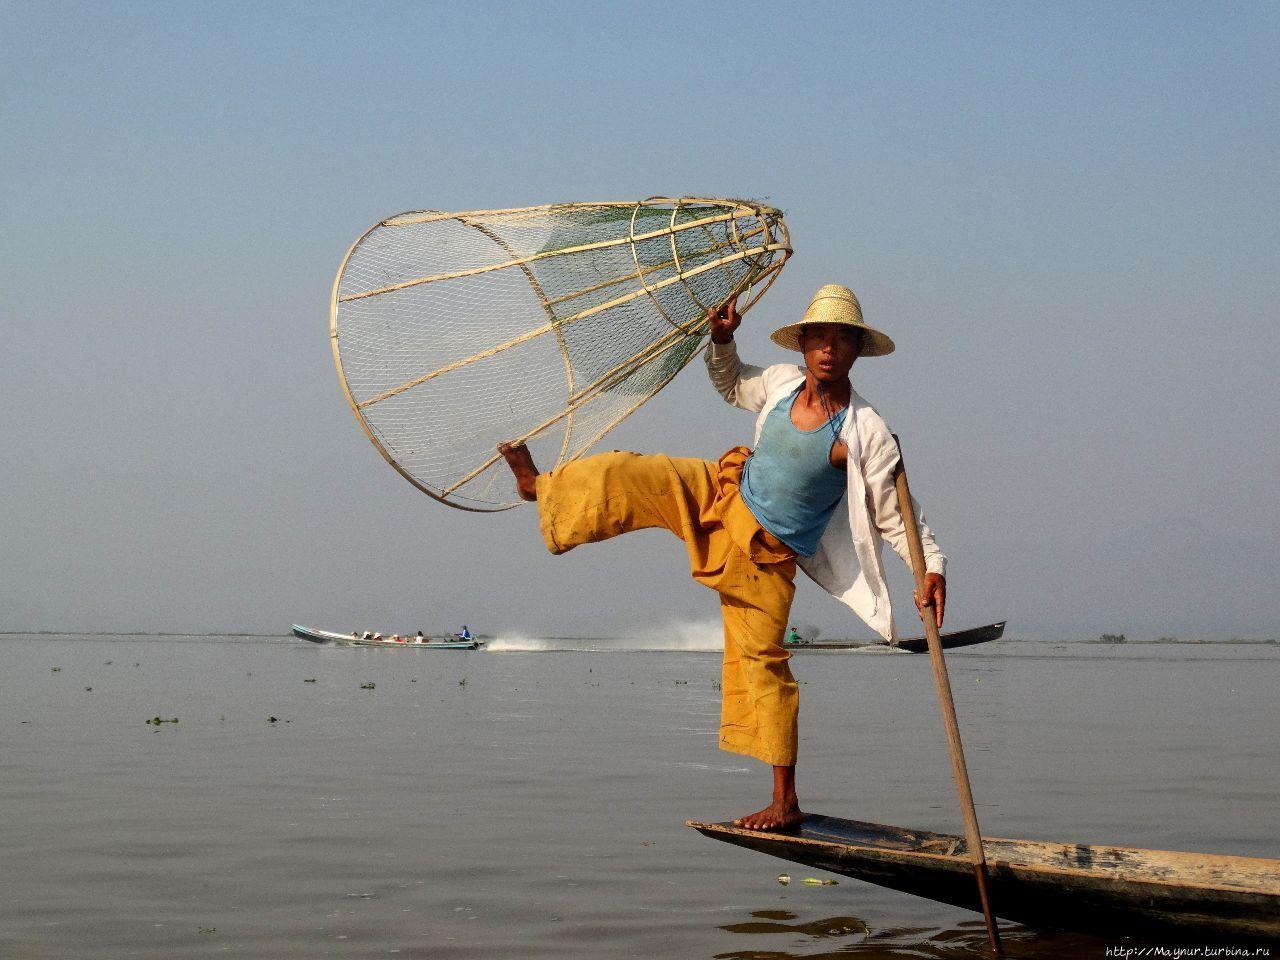 Мьянма. Озеро Инле